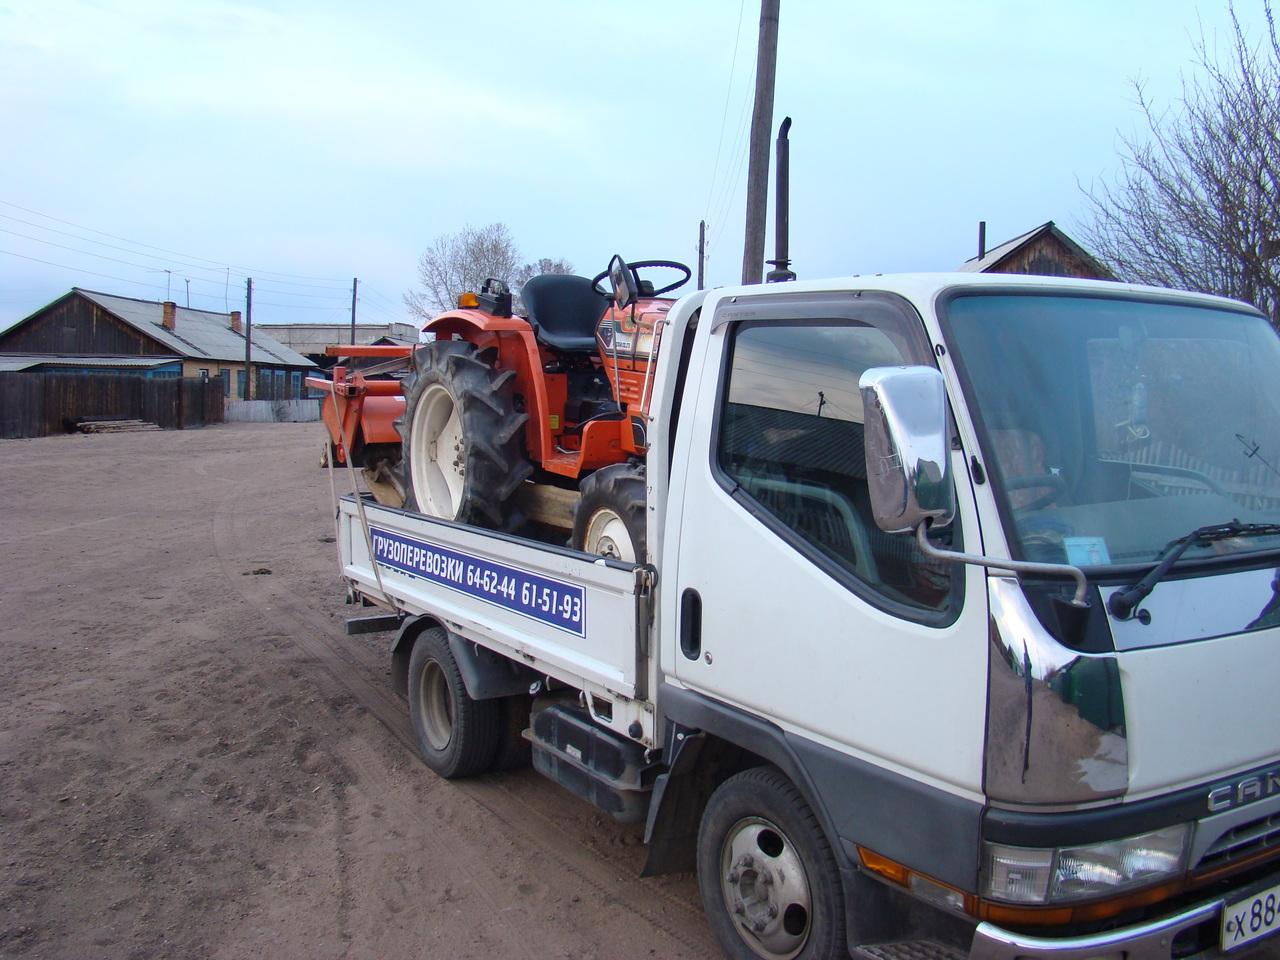 Запчасти на тракторы в Улан-Удэ